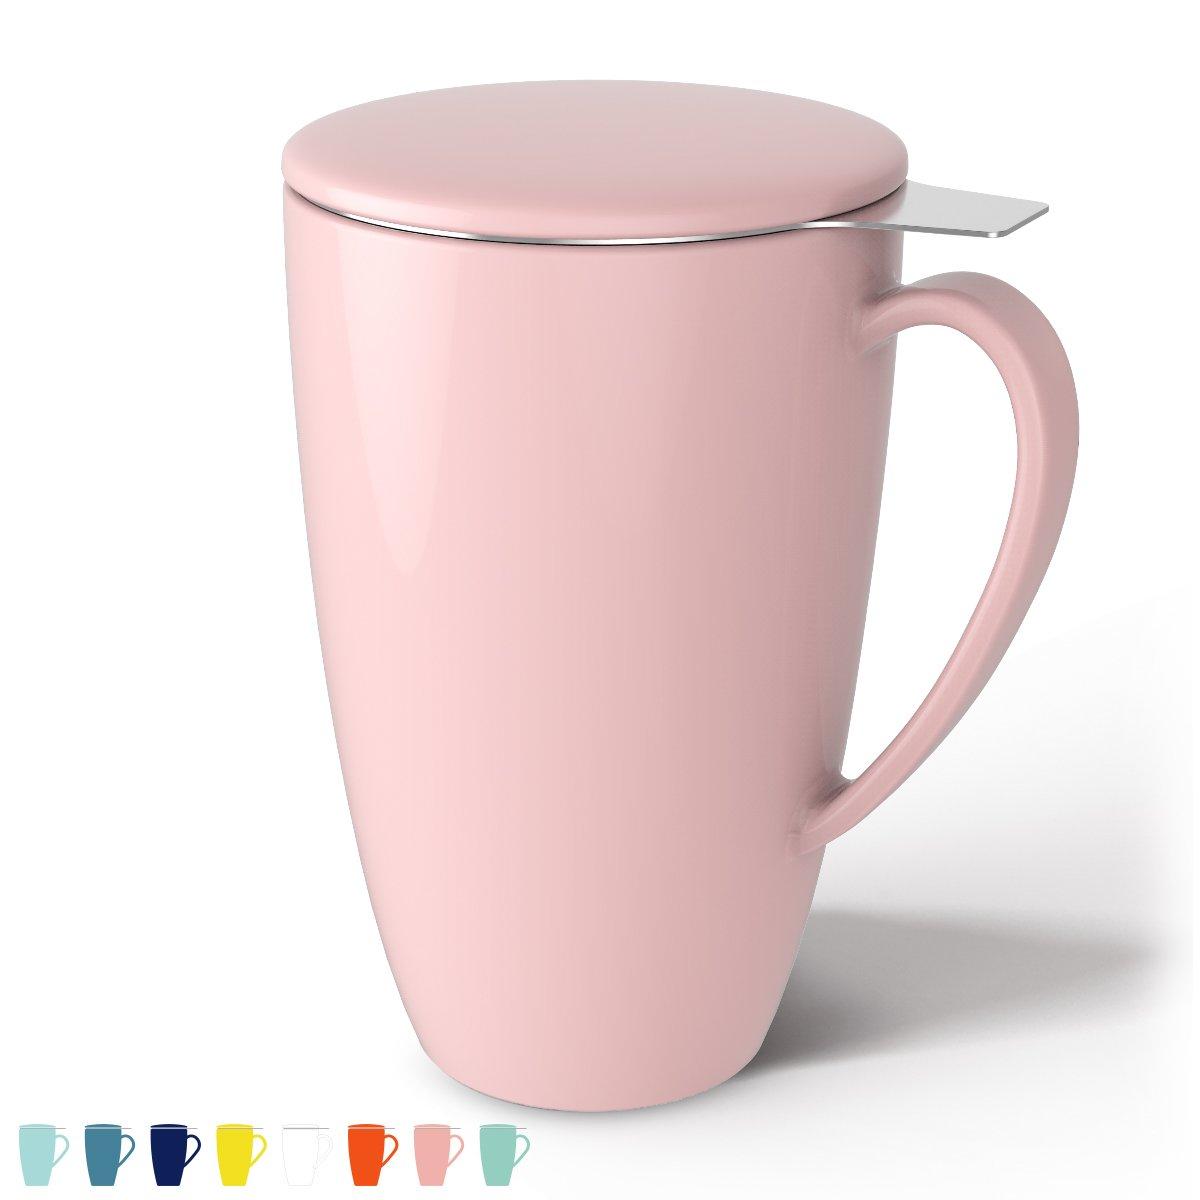 Amazon.com   Sweese 2108 Porcelain Tea Mug with Infuser and Lid, 15 ...